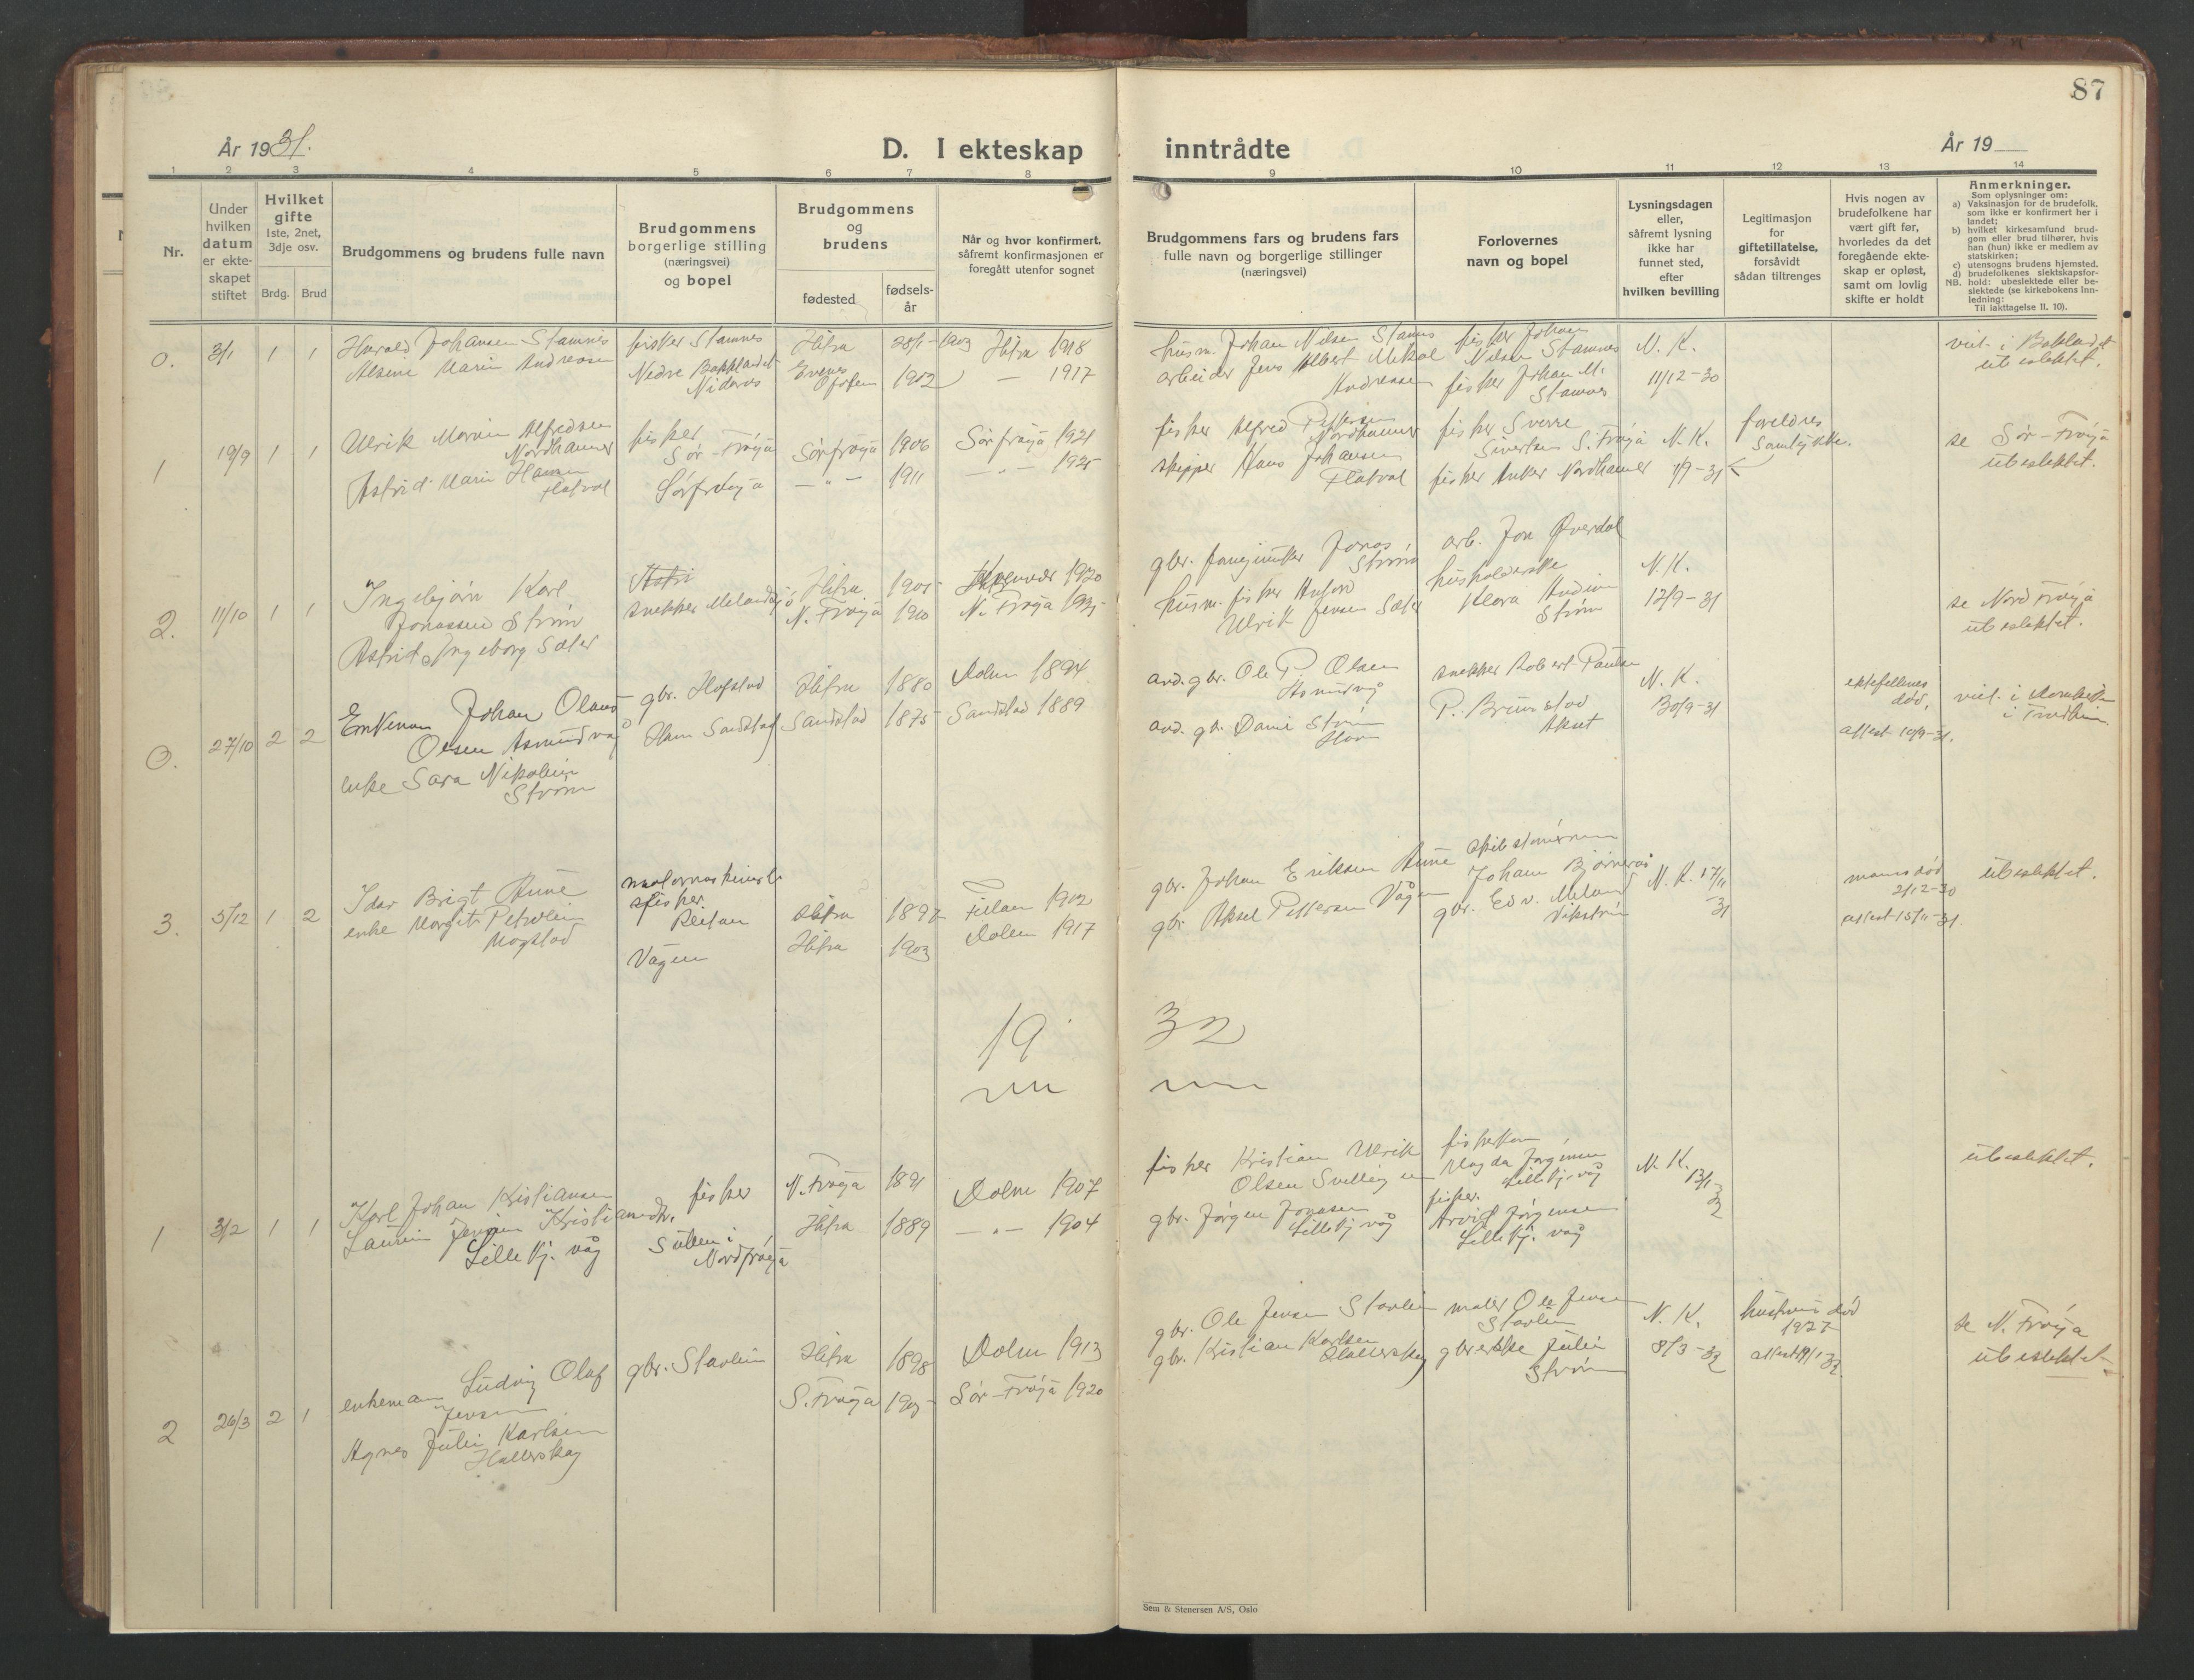 SAT, Ministerialprotokoller, klokkerbøker og fødselsregistre - Sør-Trøndelag, 634/L0544: Parish register (copy) no. 634C06, 1927-1948, p. 87